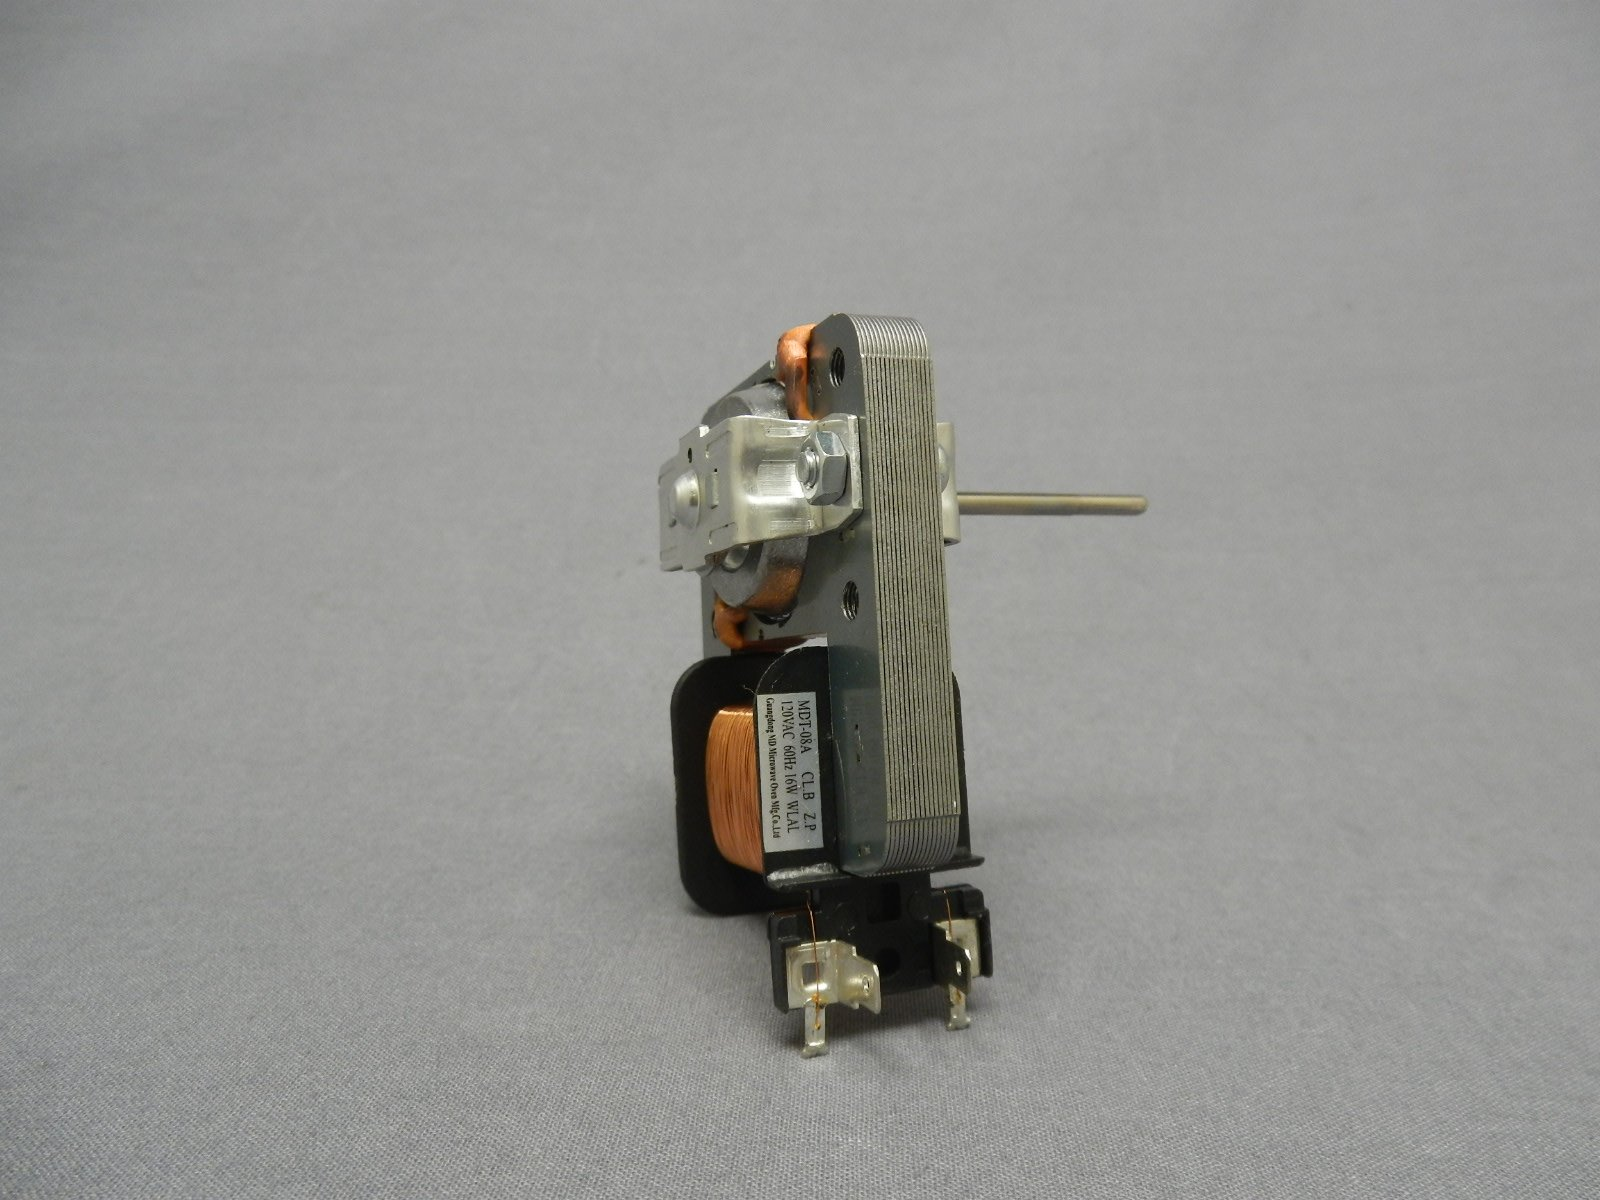 Frigidaire 5304464118 Microwave Cooling Fan Motor Genuine Original Equipment Manufacturer (OEM) Part for Frigidaire, Universal/Multiflex (Frigidaire), Kenmore, Kenmore Elite, Electrolux